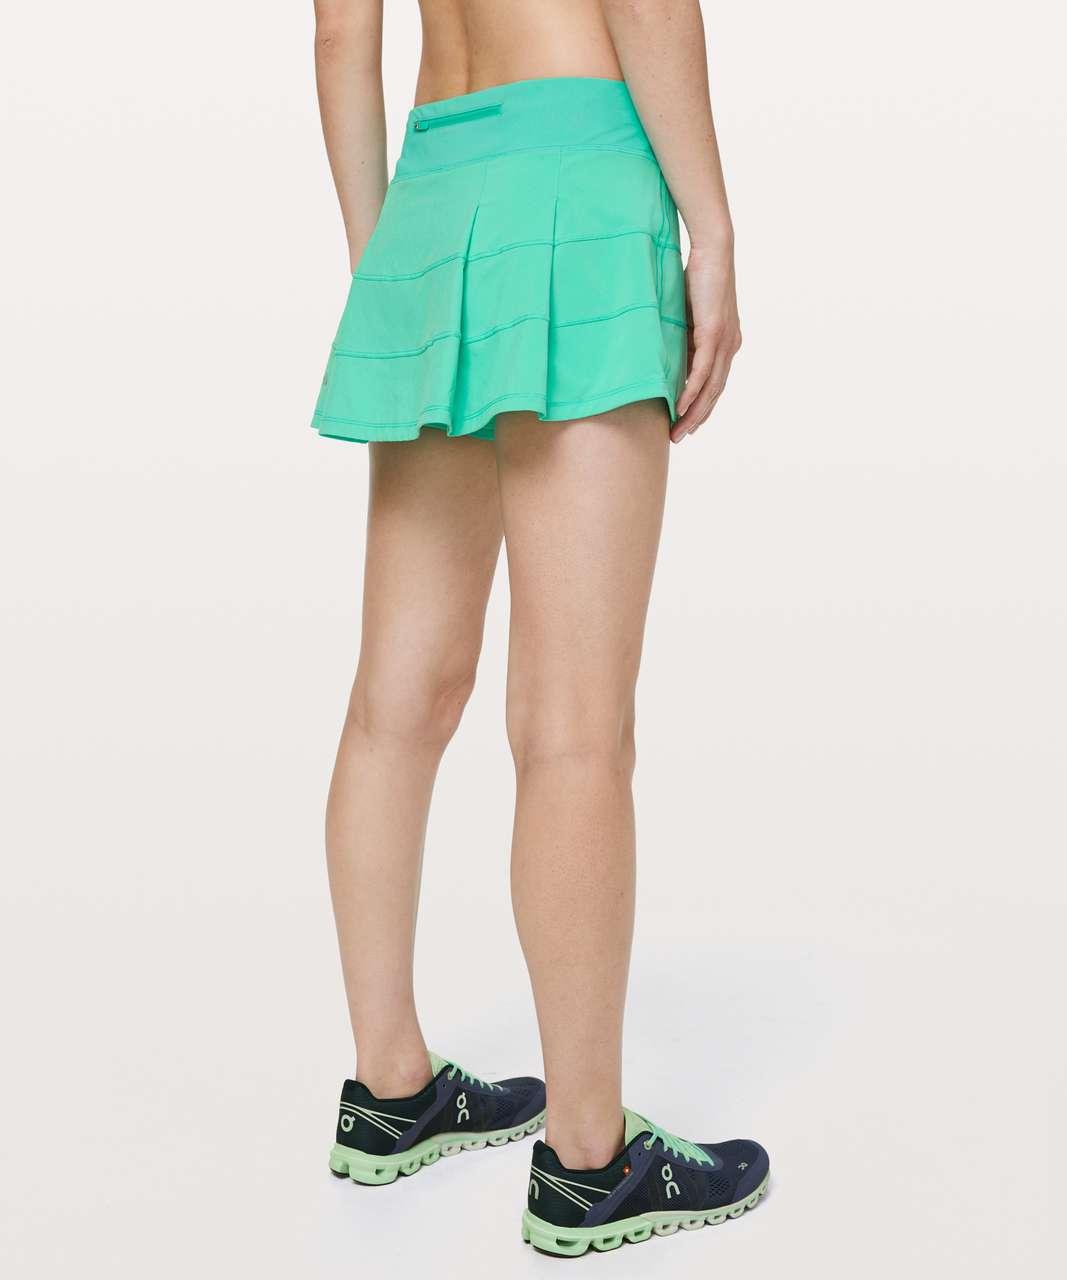 "Lululemon Pace Rival Skirt (Regular) *4-way Stretch 13"" - Bali Breeze"